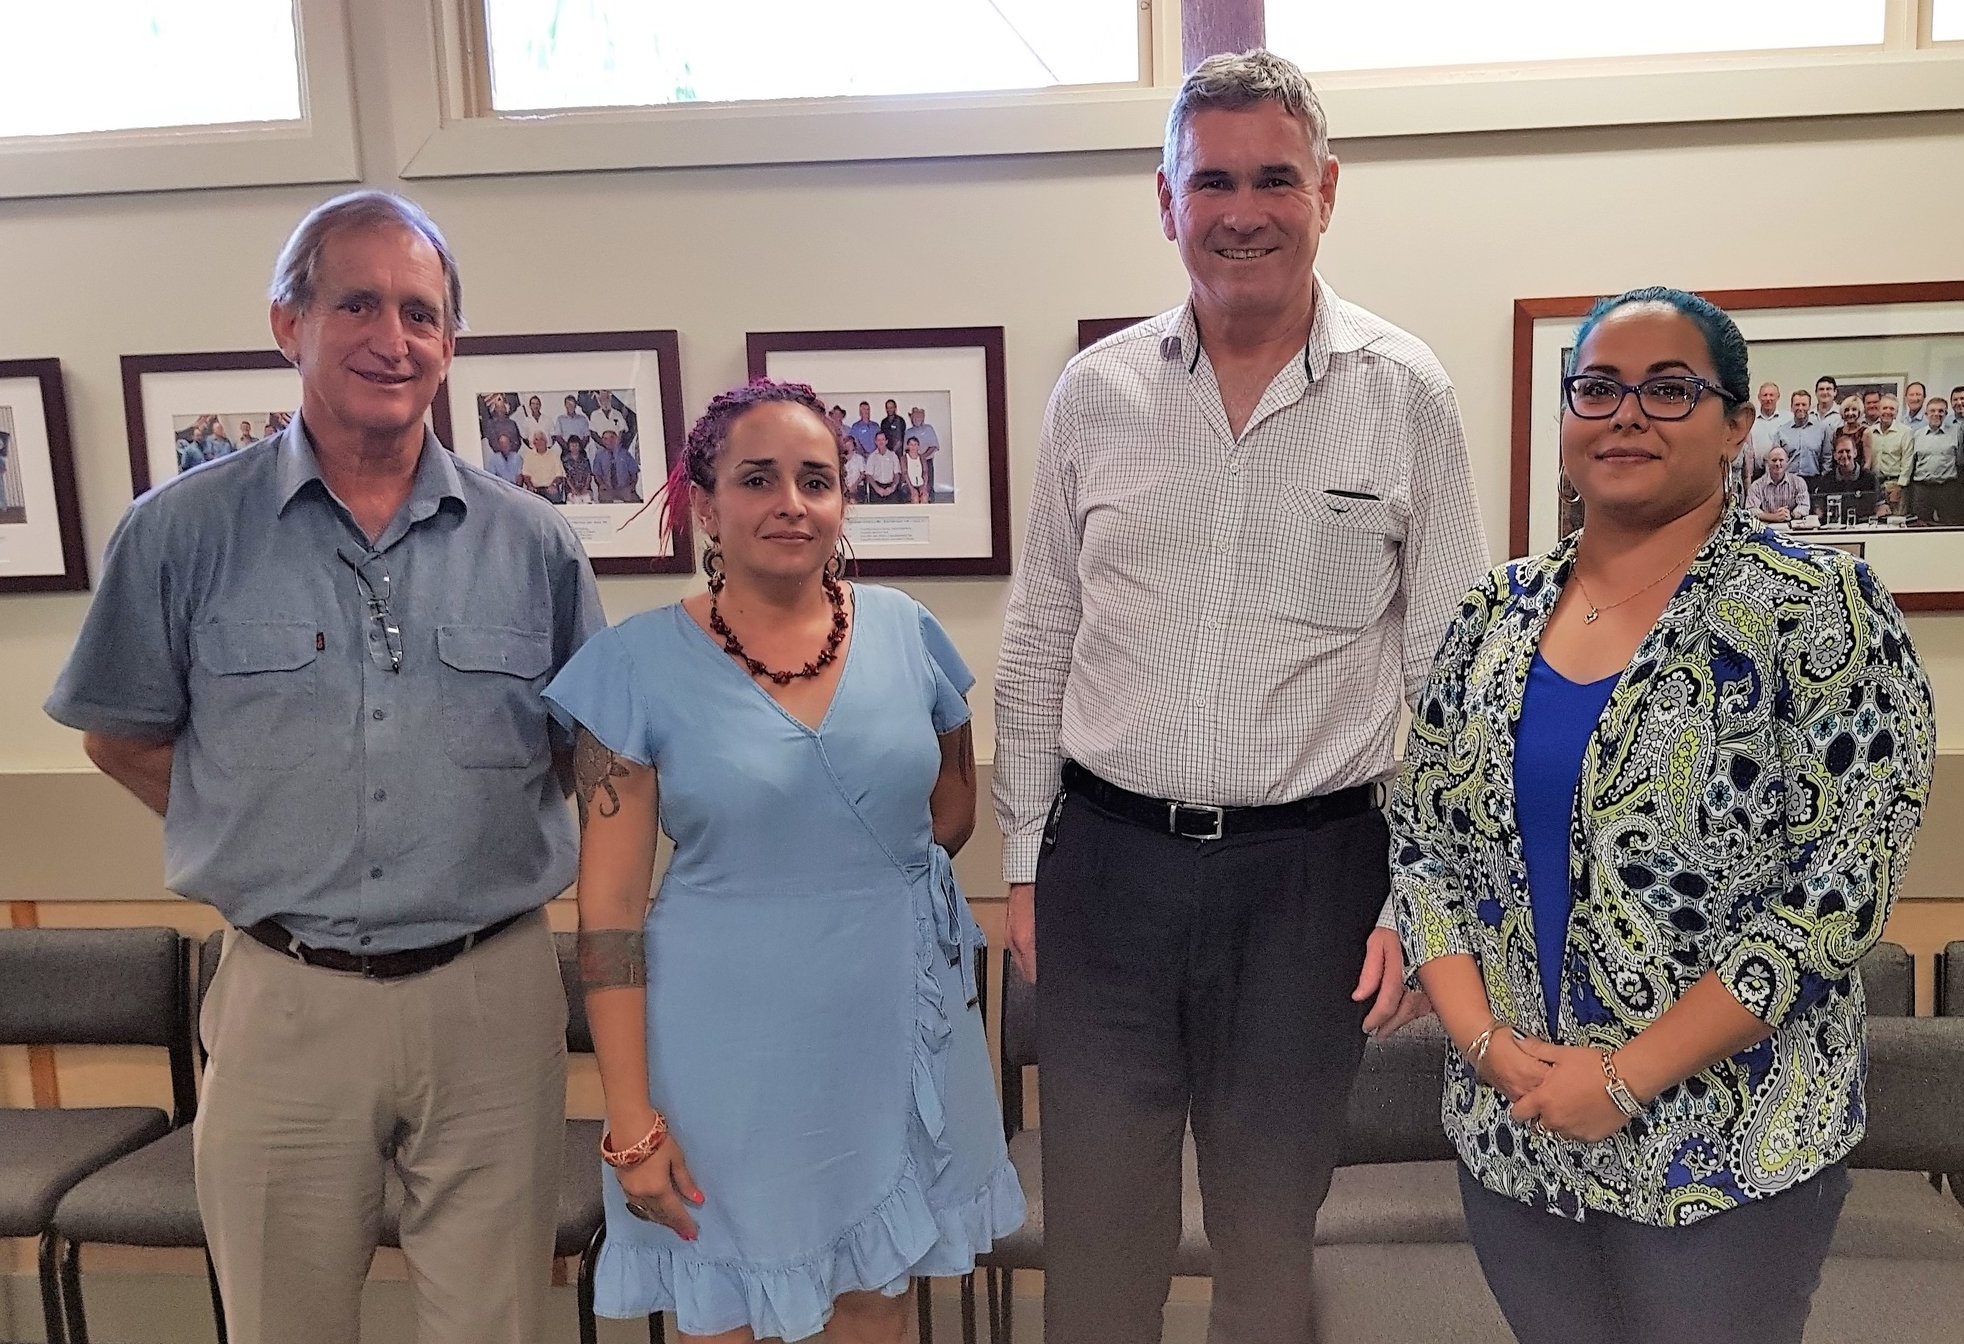 Cook Shire Mayor Peter Scott, Councillor Larissa Hale, Cook Shire CEO Tim Cronin with AbCF Community Development Officer Lauren Bowyer